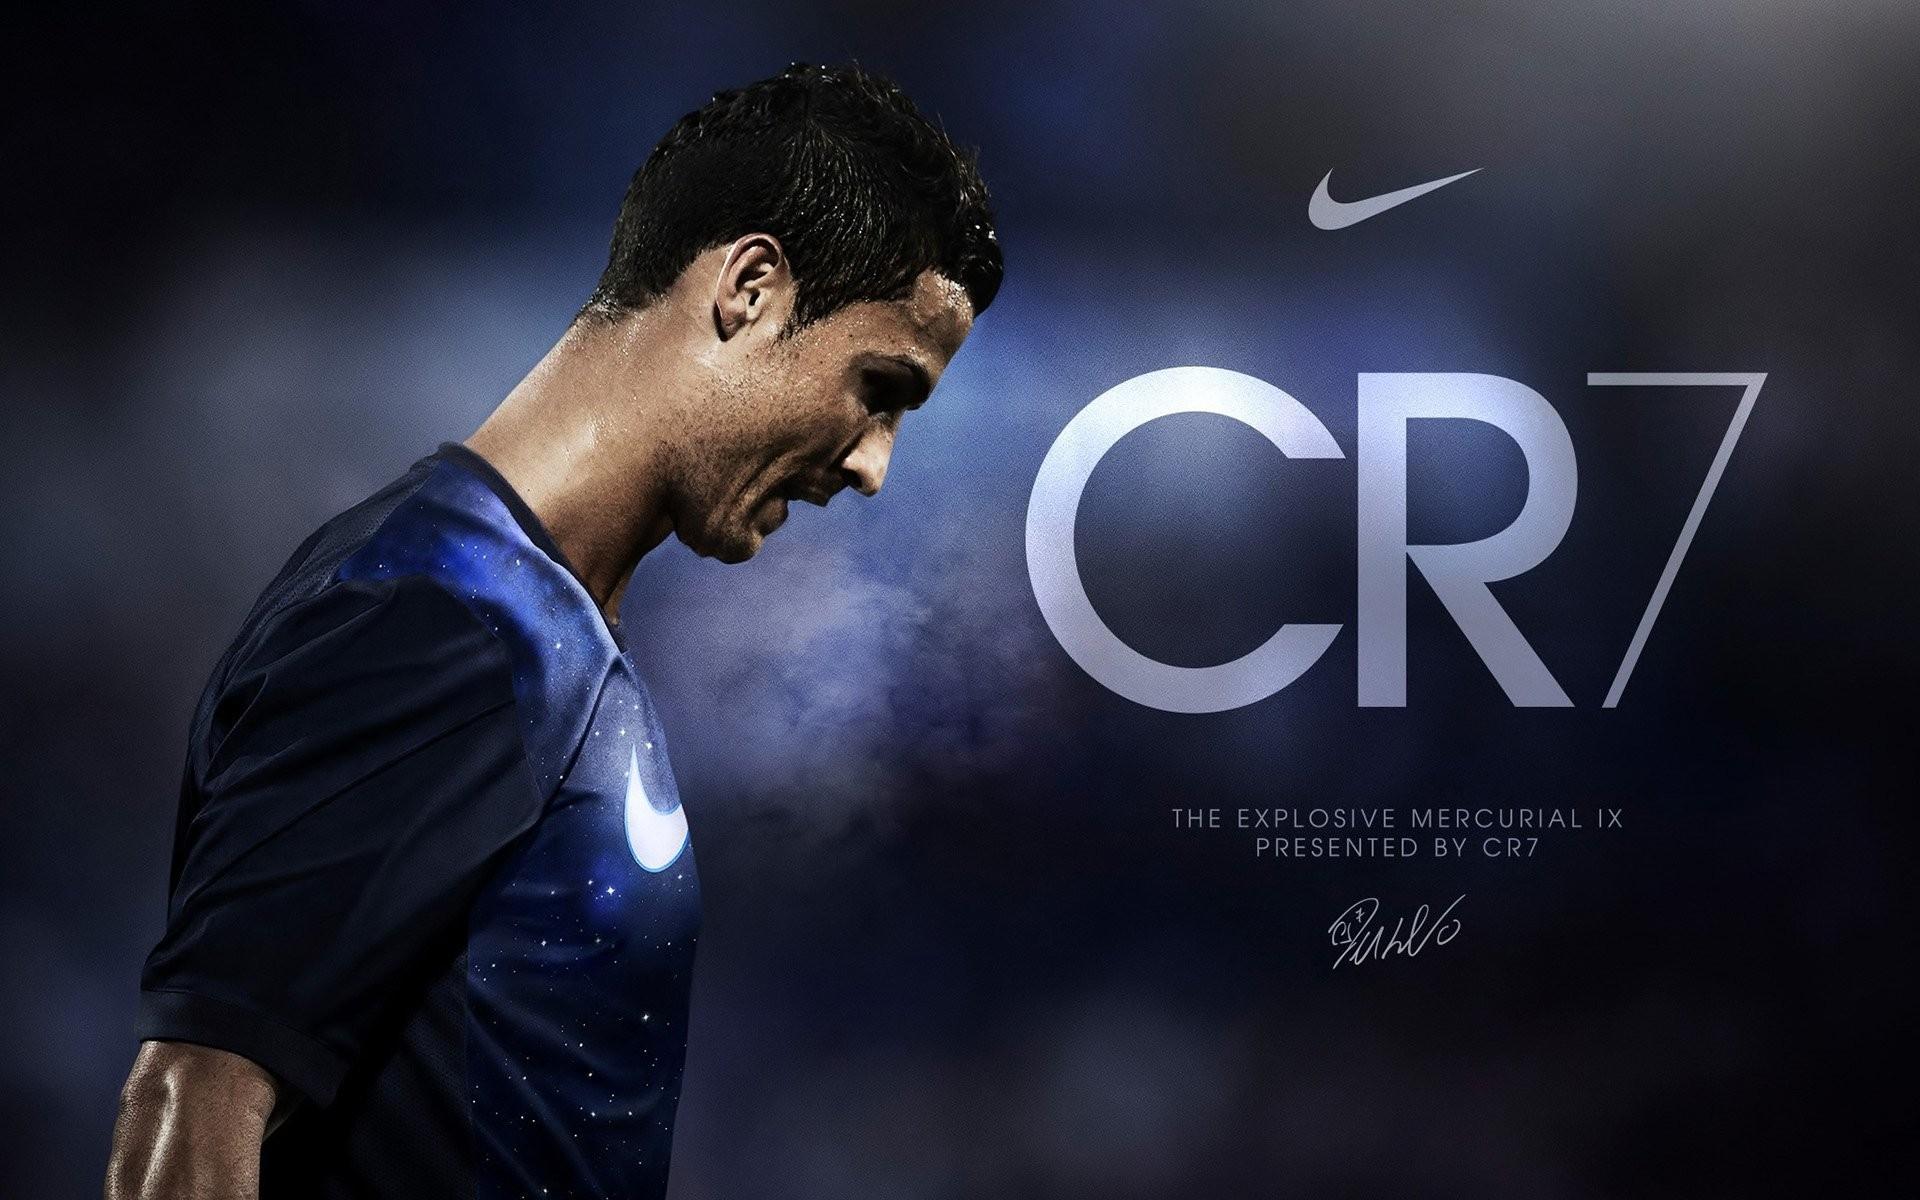 Cristiano Ronaldo Wallpaper Download Free Amazing High